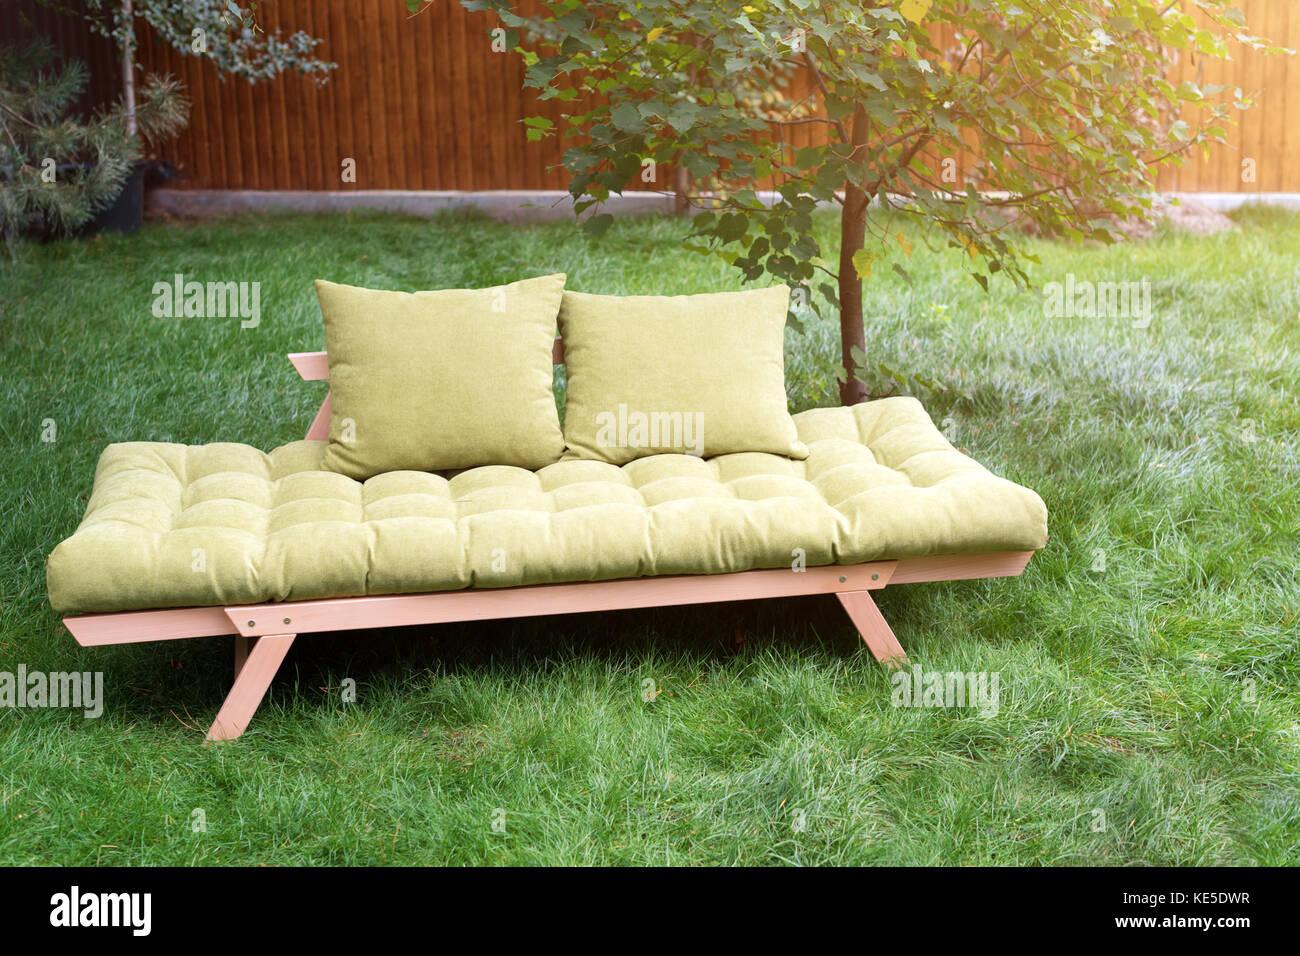 Green Sofa In The Yard Outdoors. Outdoor Furniture In Green Garden Patio.    Stock